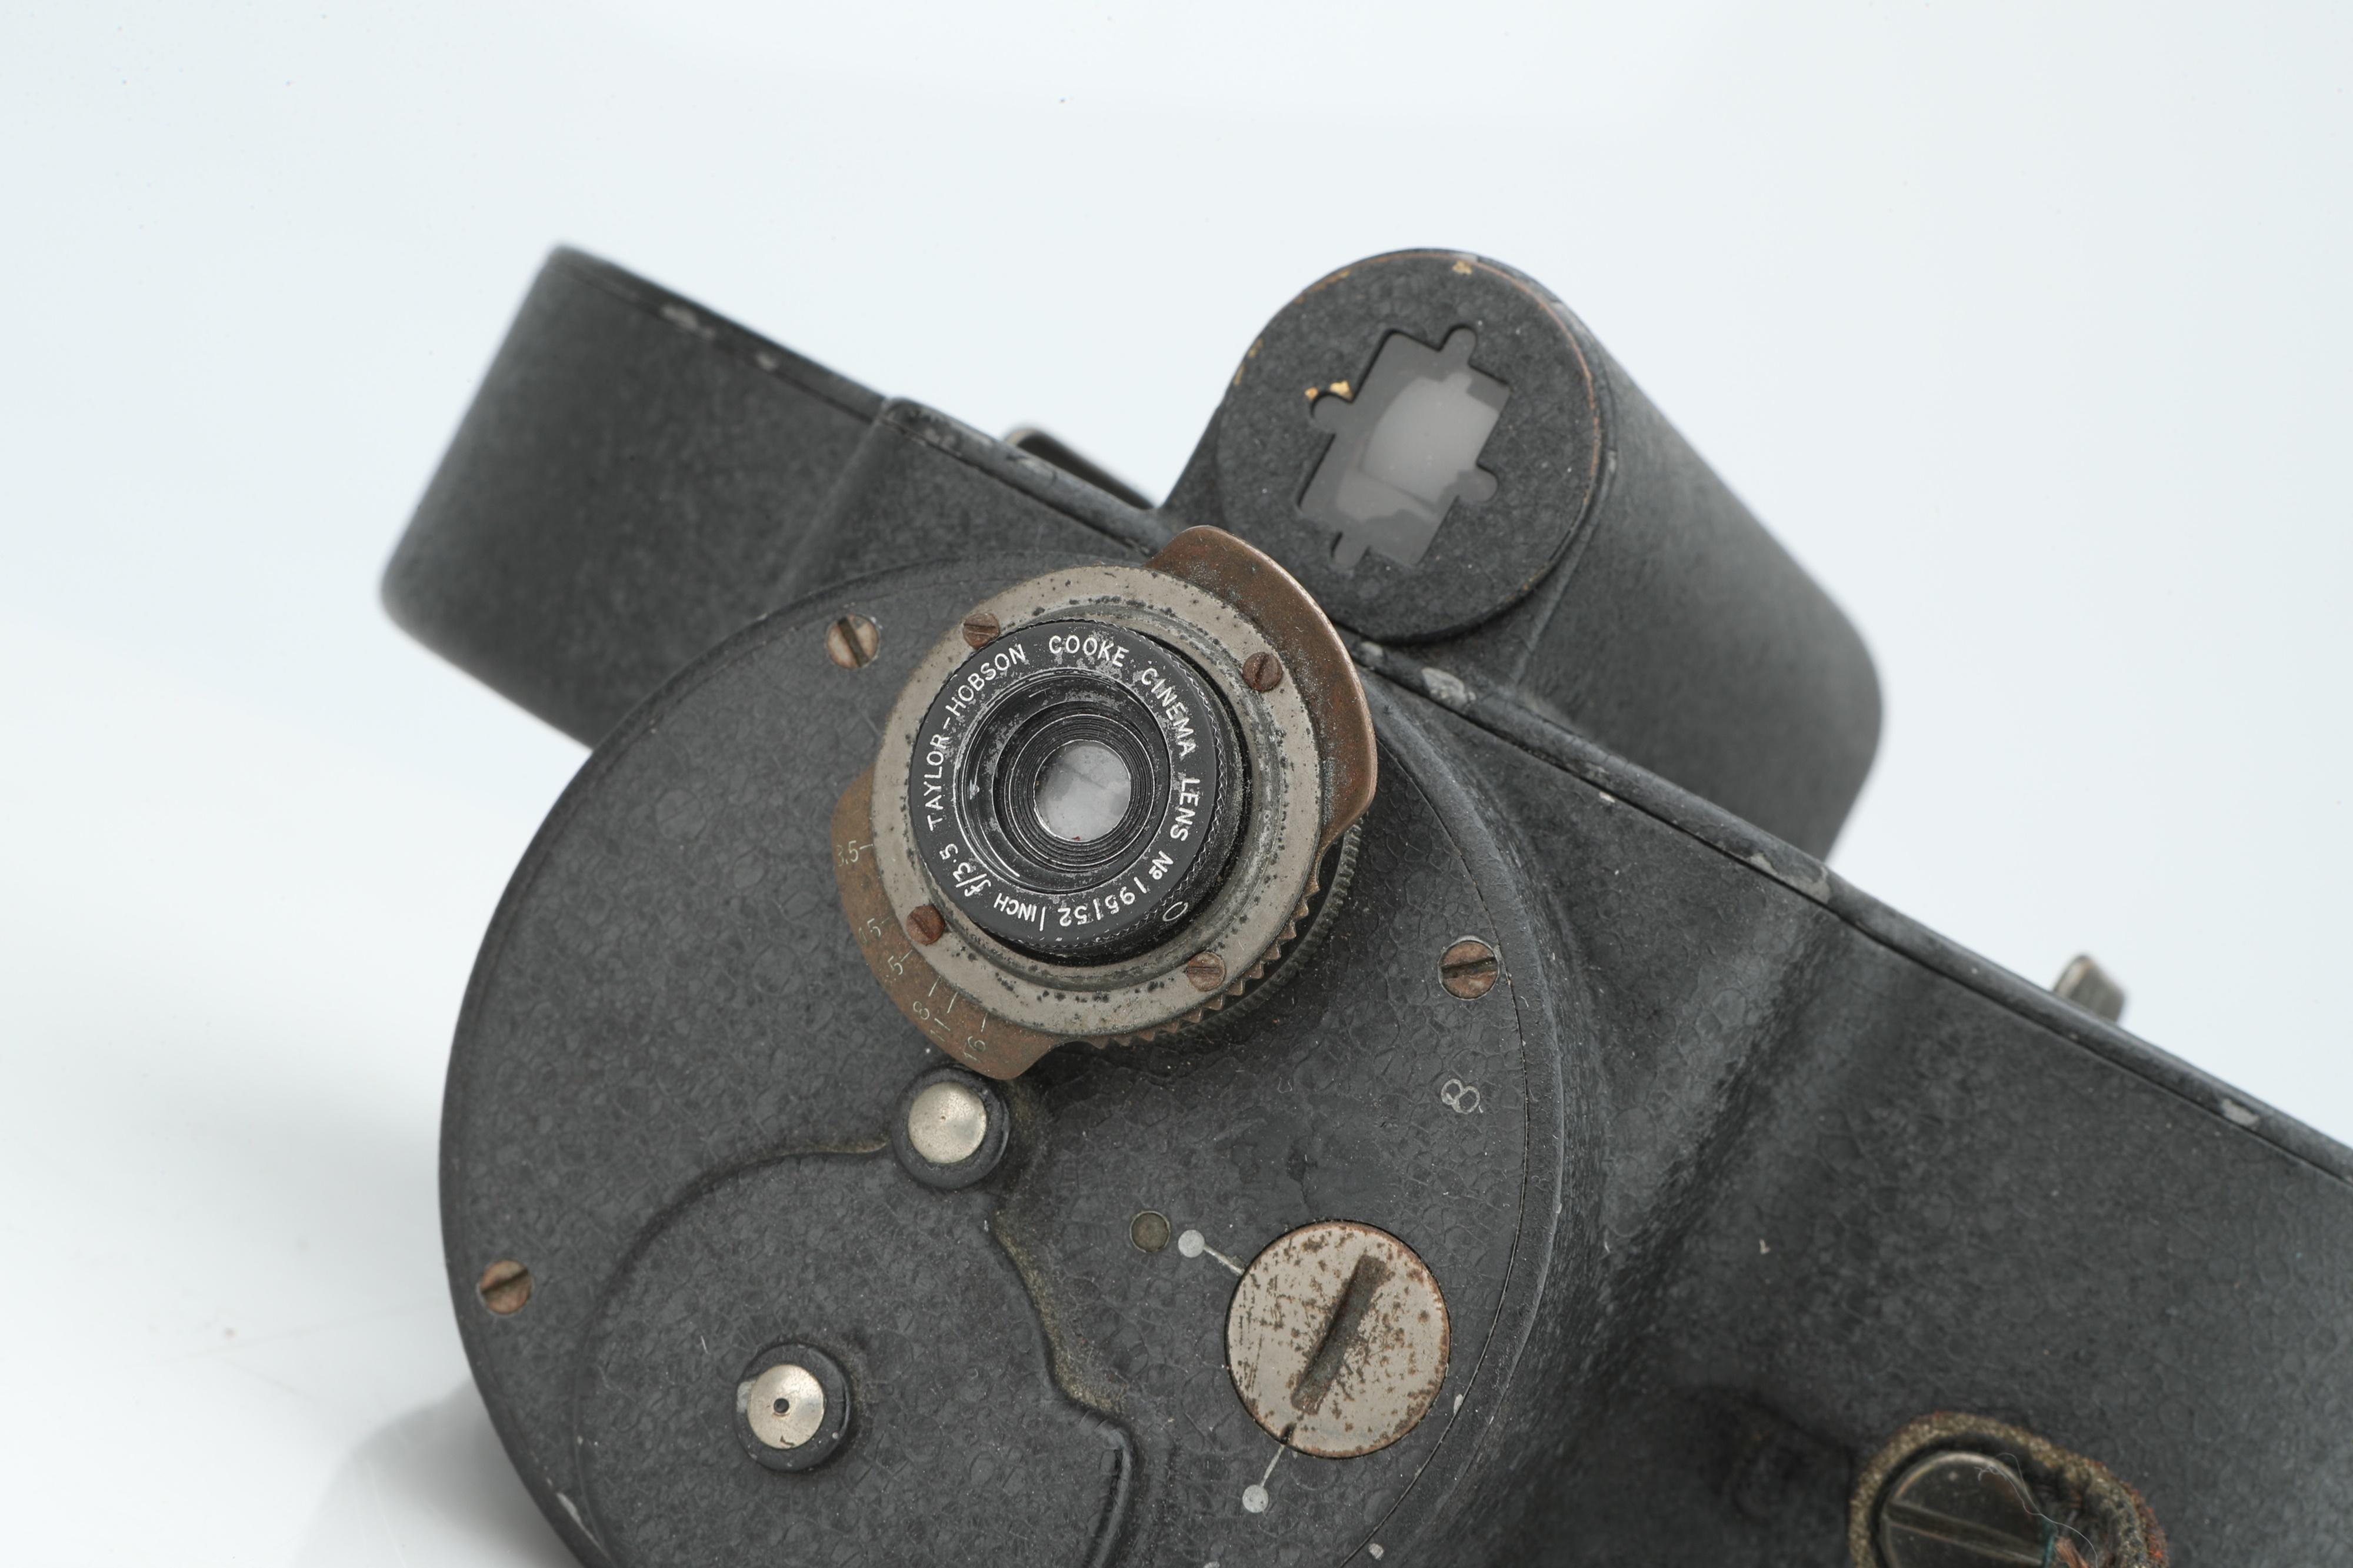 A Bell & Howell Filmo 70 Cine Camera, - Image 2 of 2